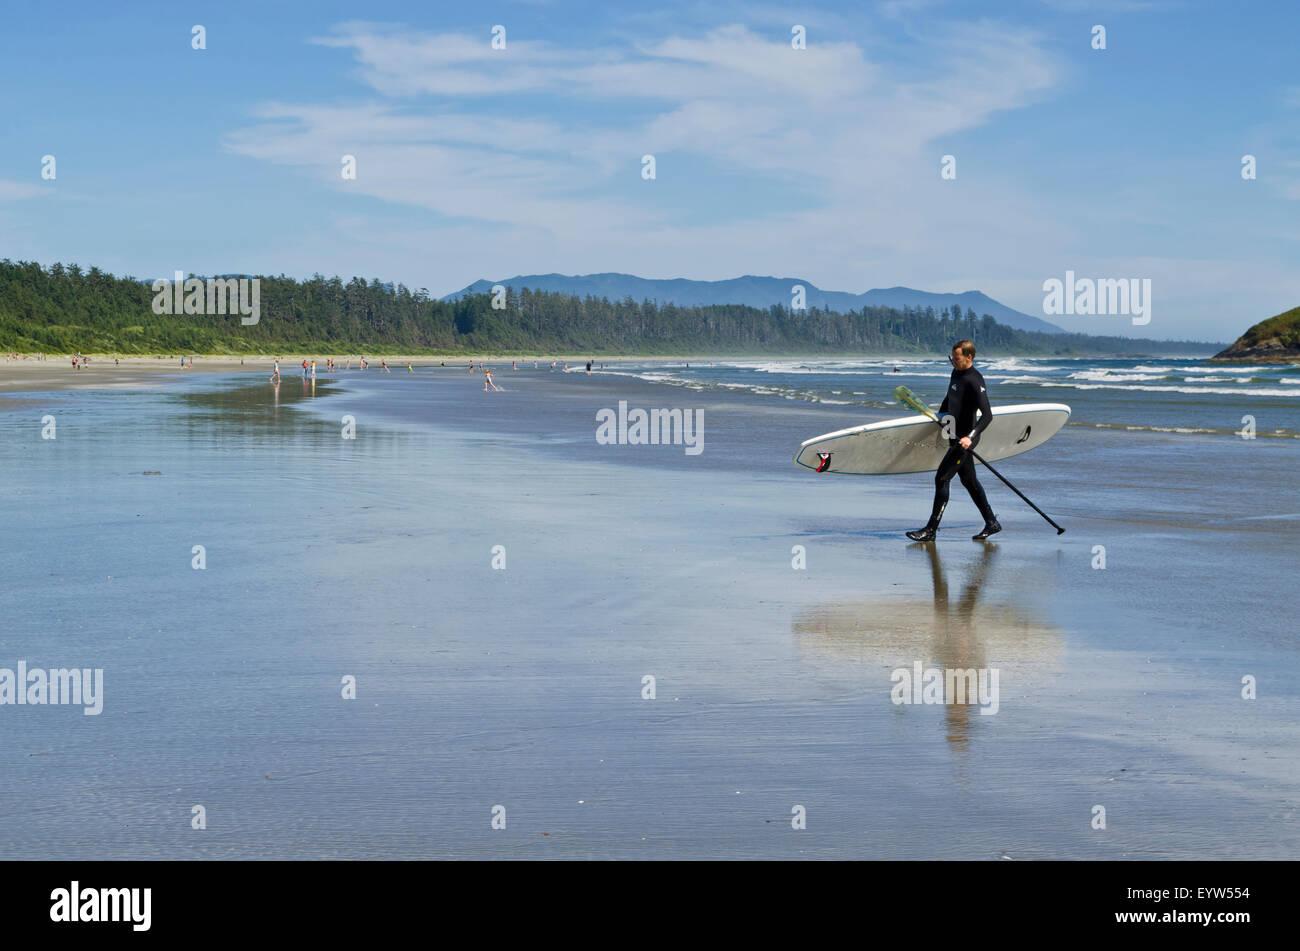 man-in-wet-suit-walking-on-the-beach-car